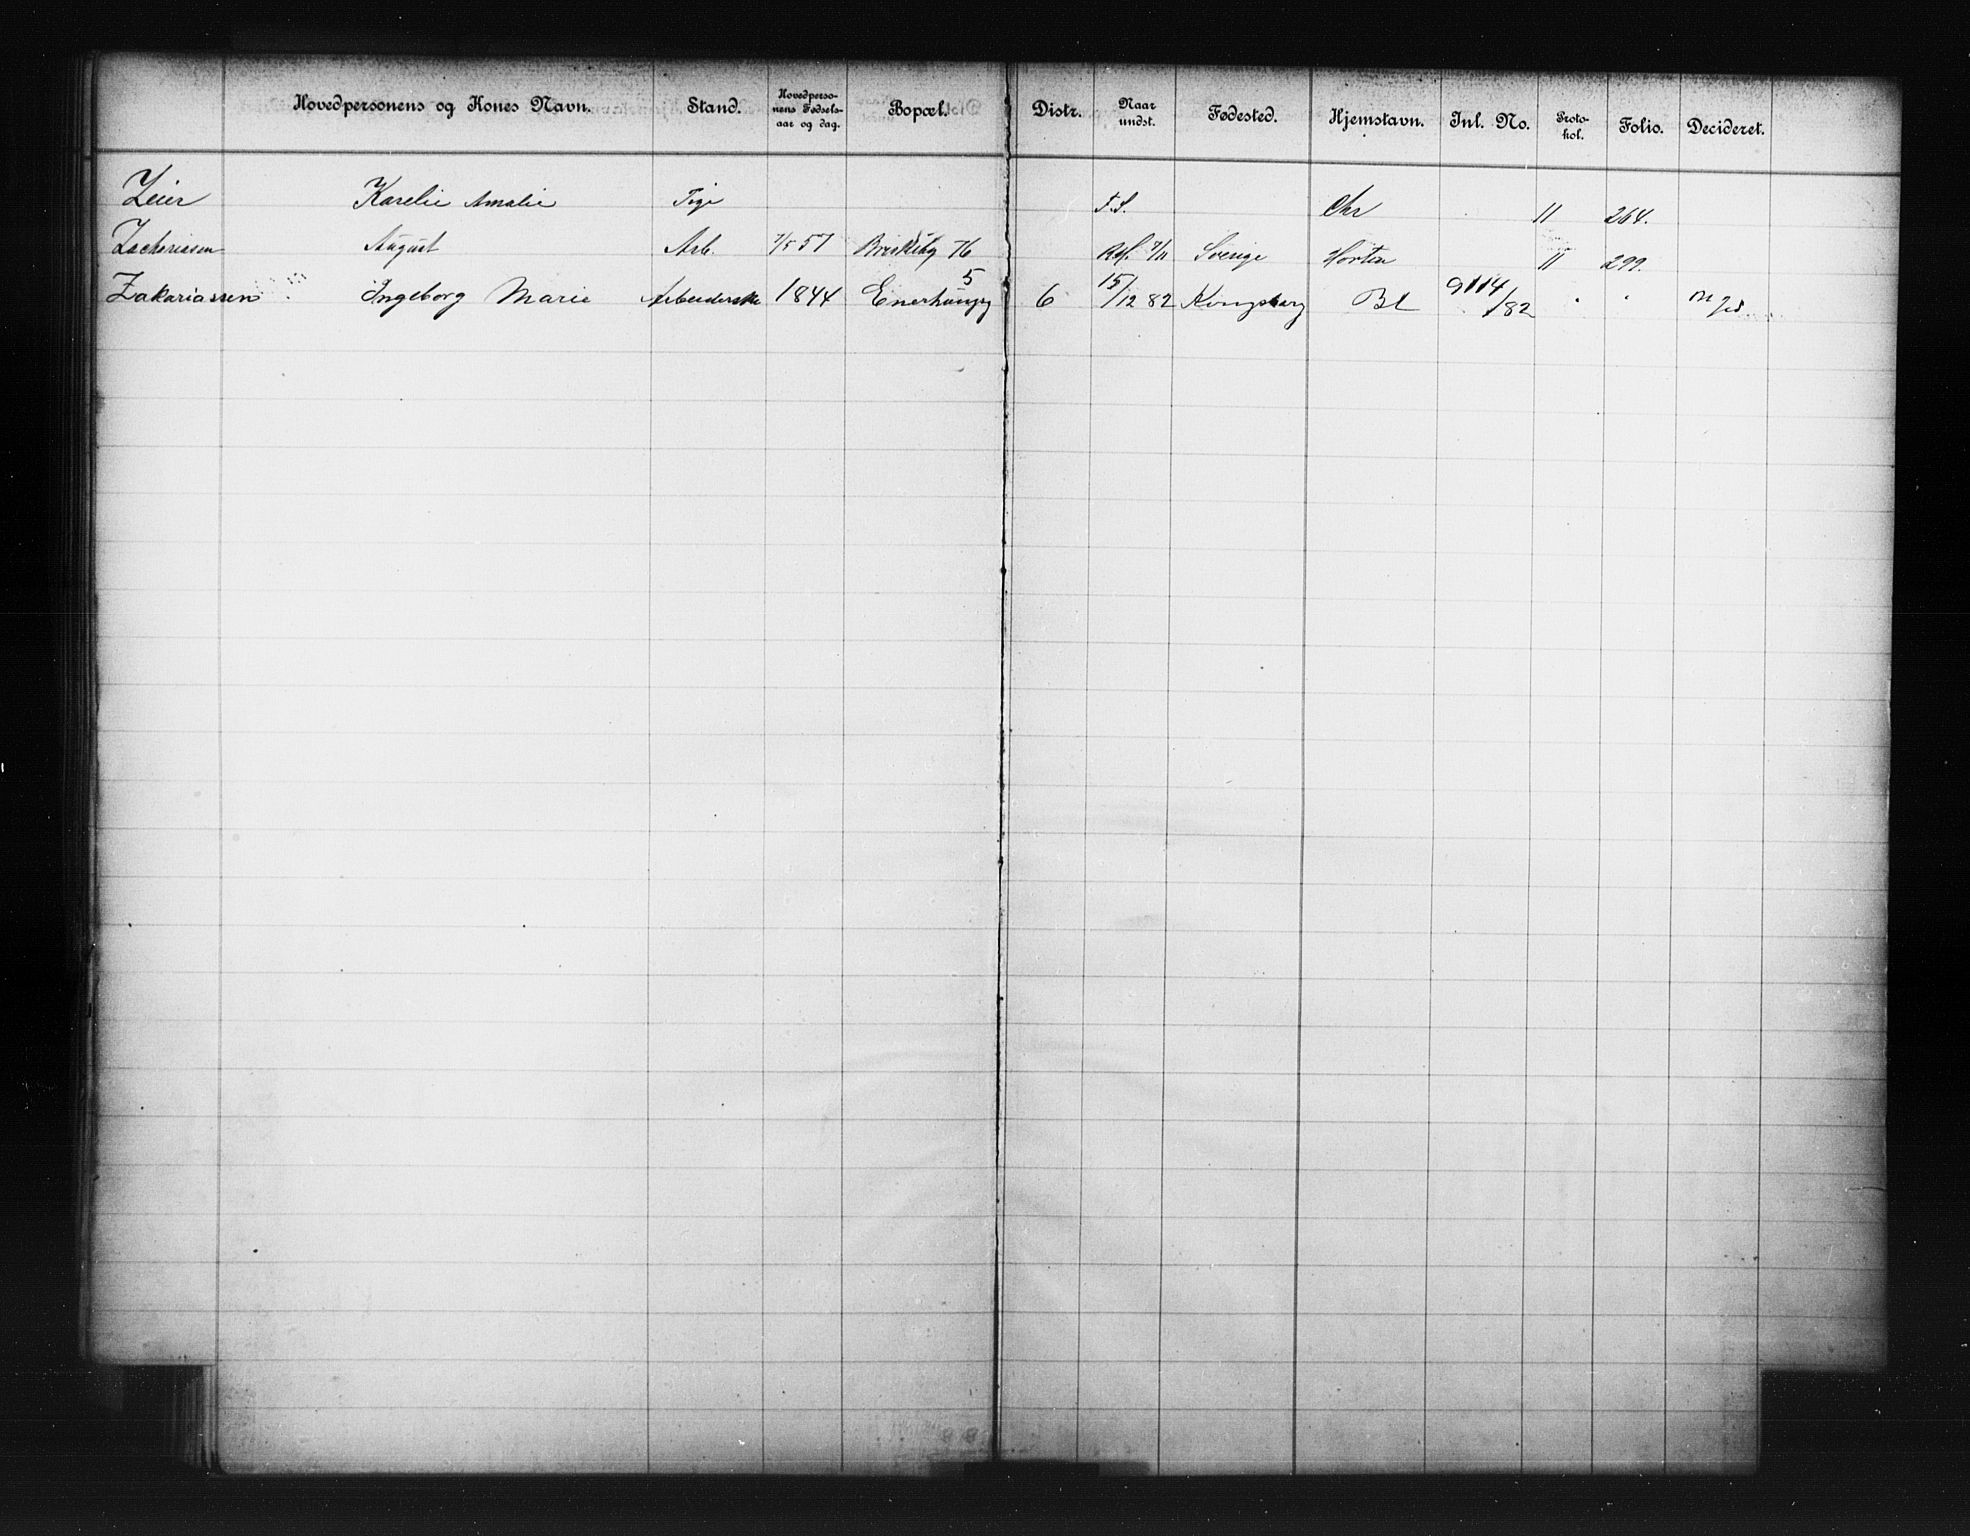 OBA, Fattigvesenet, Fb/L0001: Hjemstavnsregister, 1881, s. 157